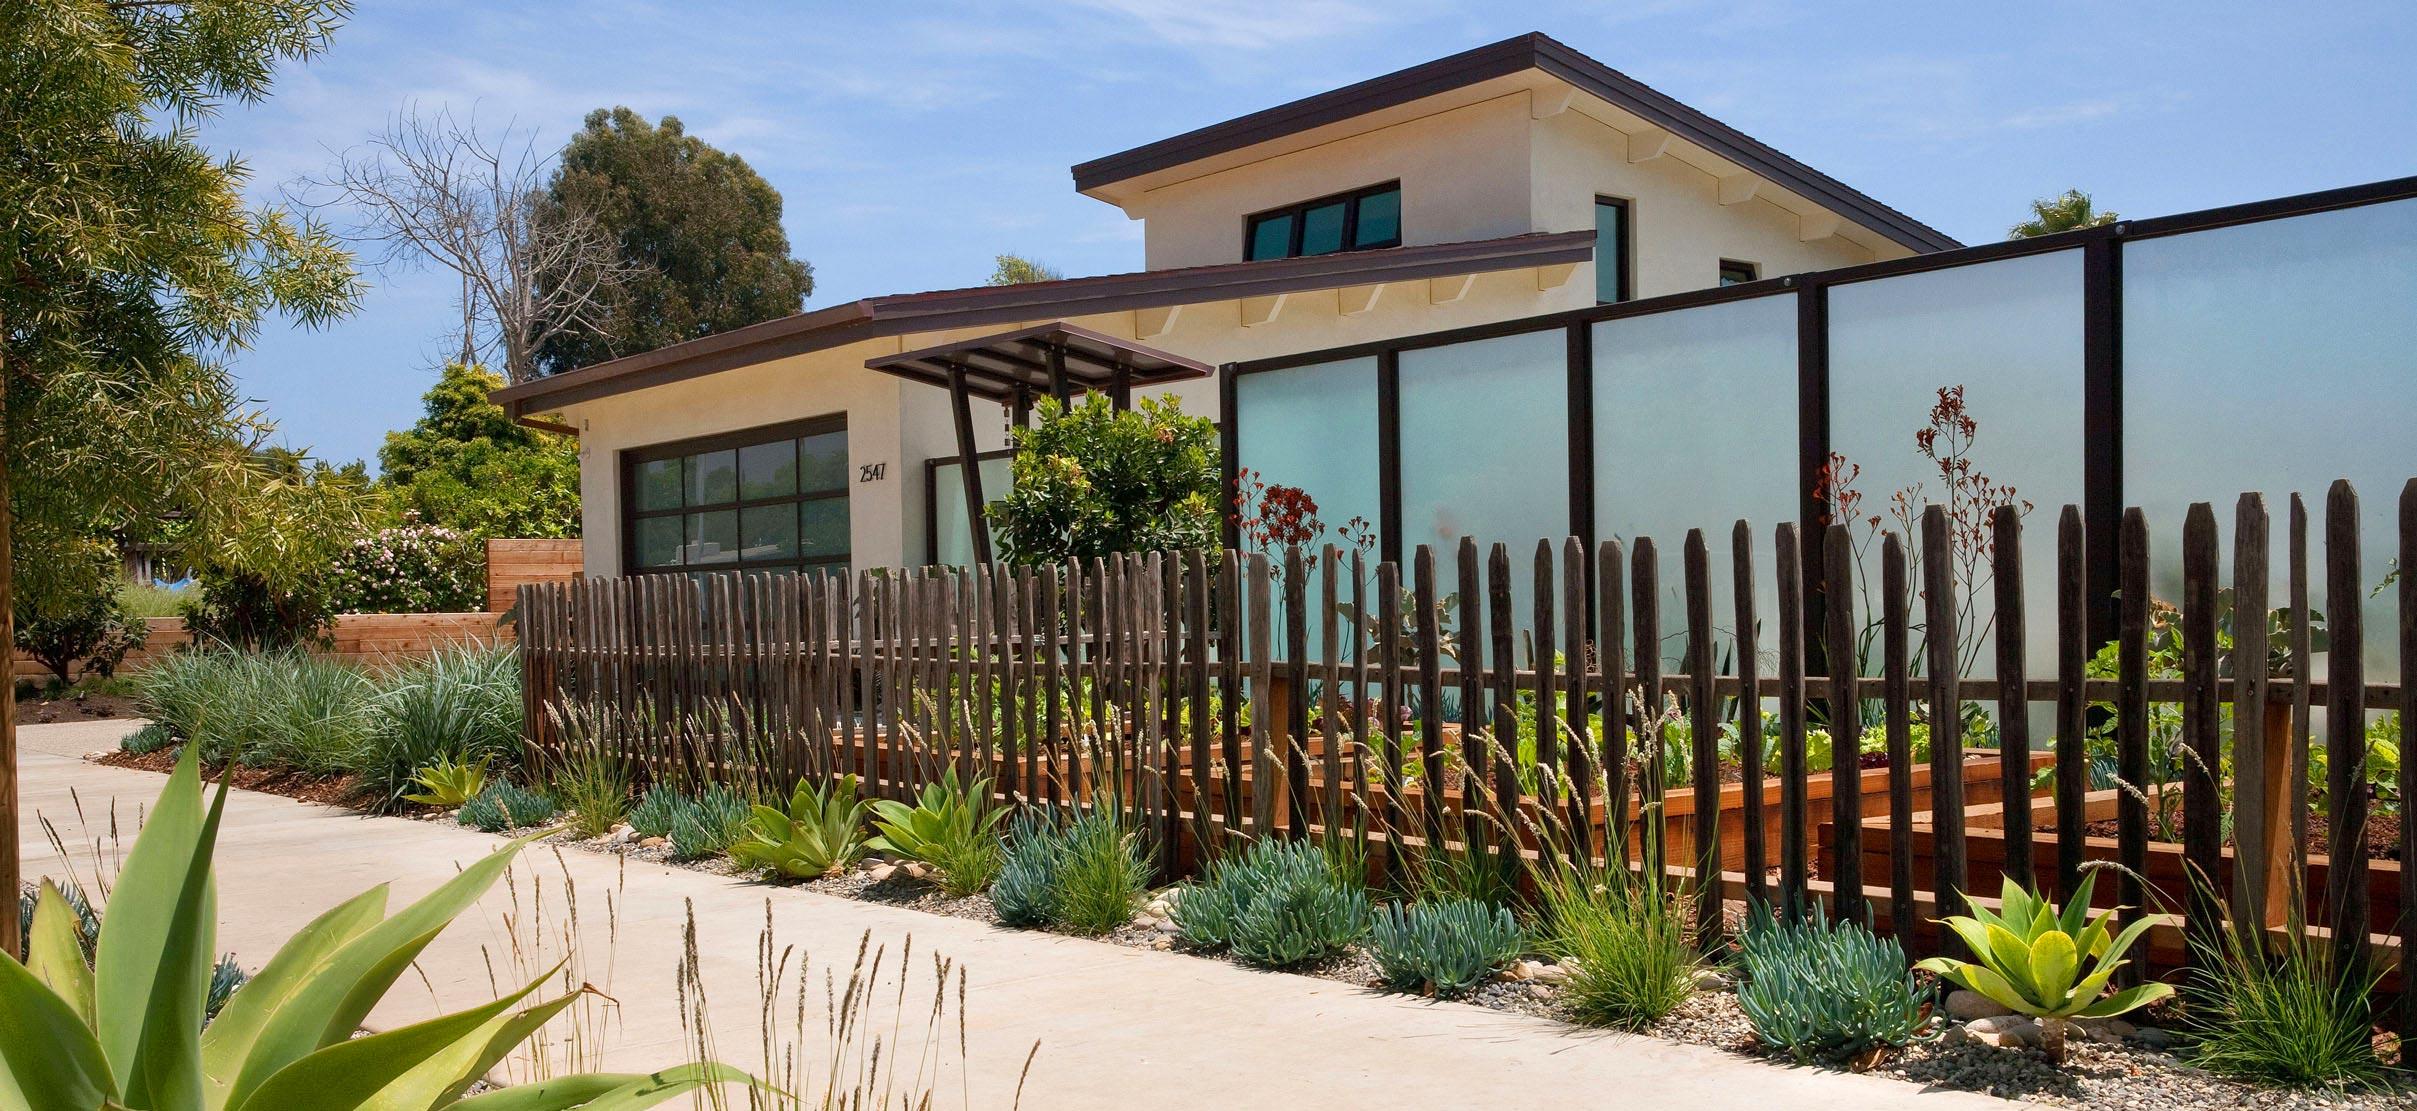 10-wooden-fence.jpg